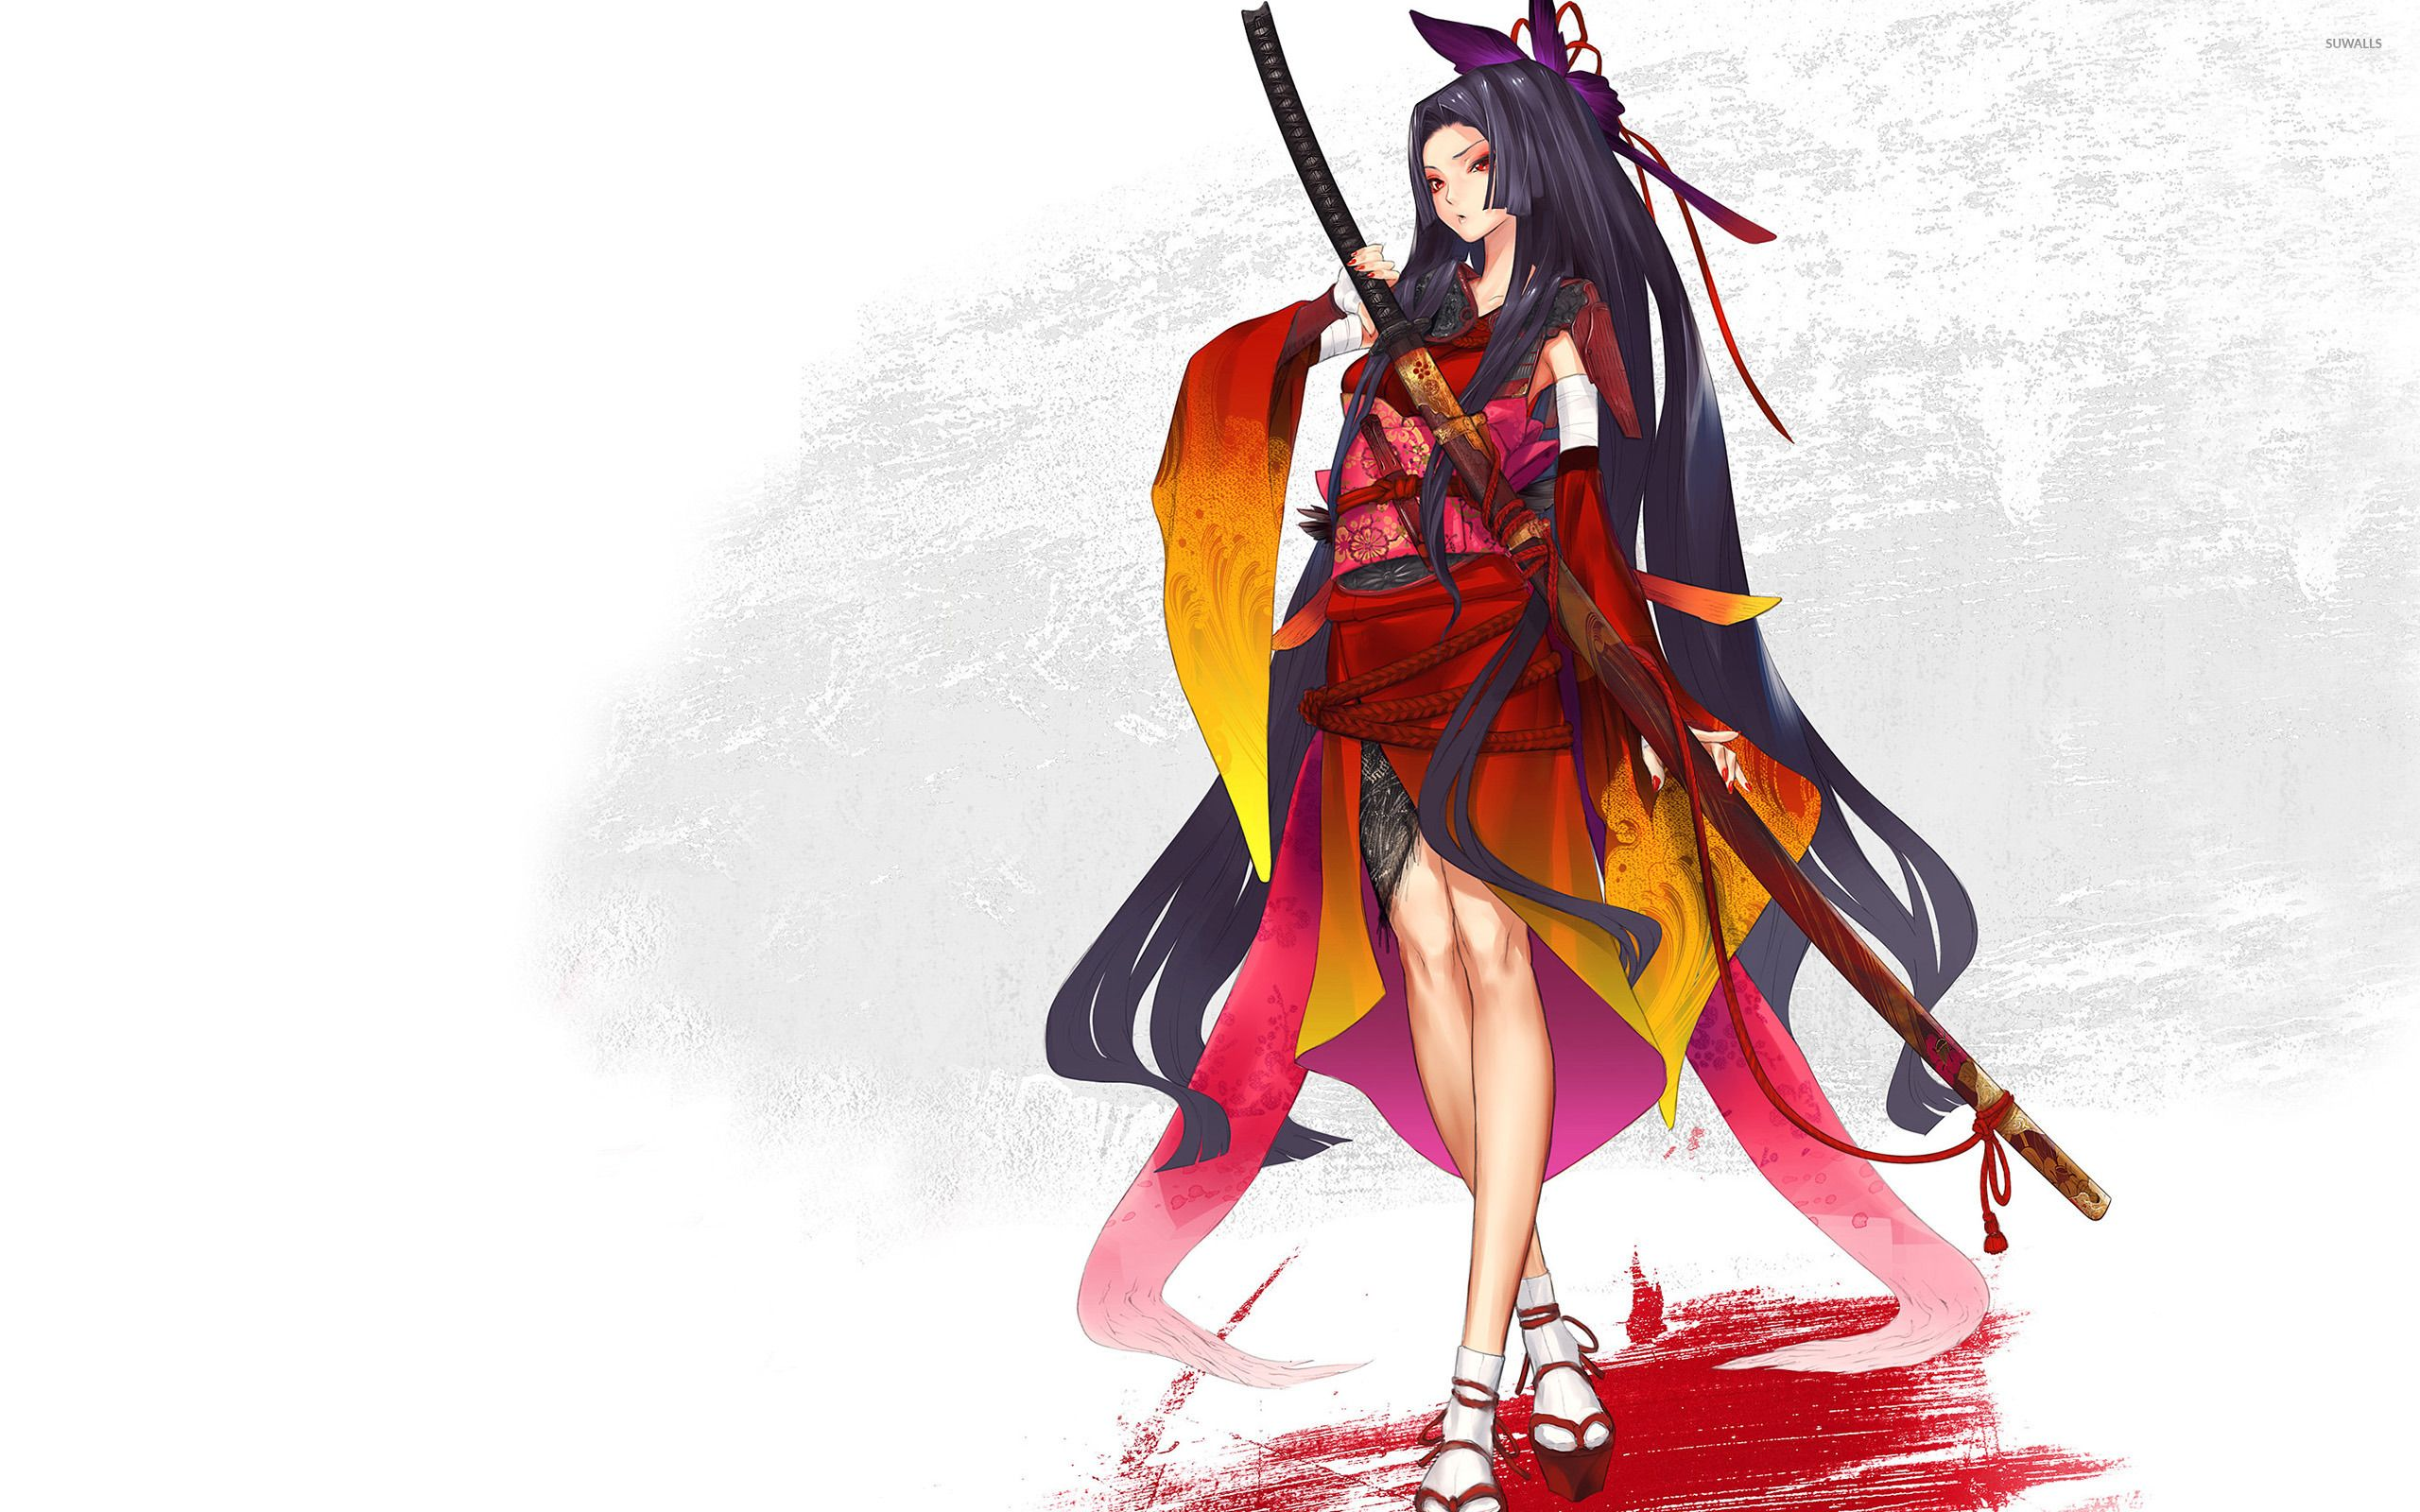 Anime Samurai Wallpapers - Top Free Anime Samurai ...